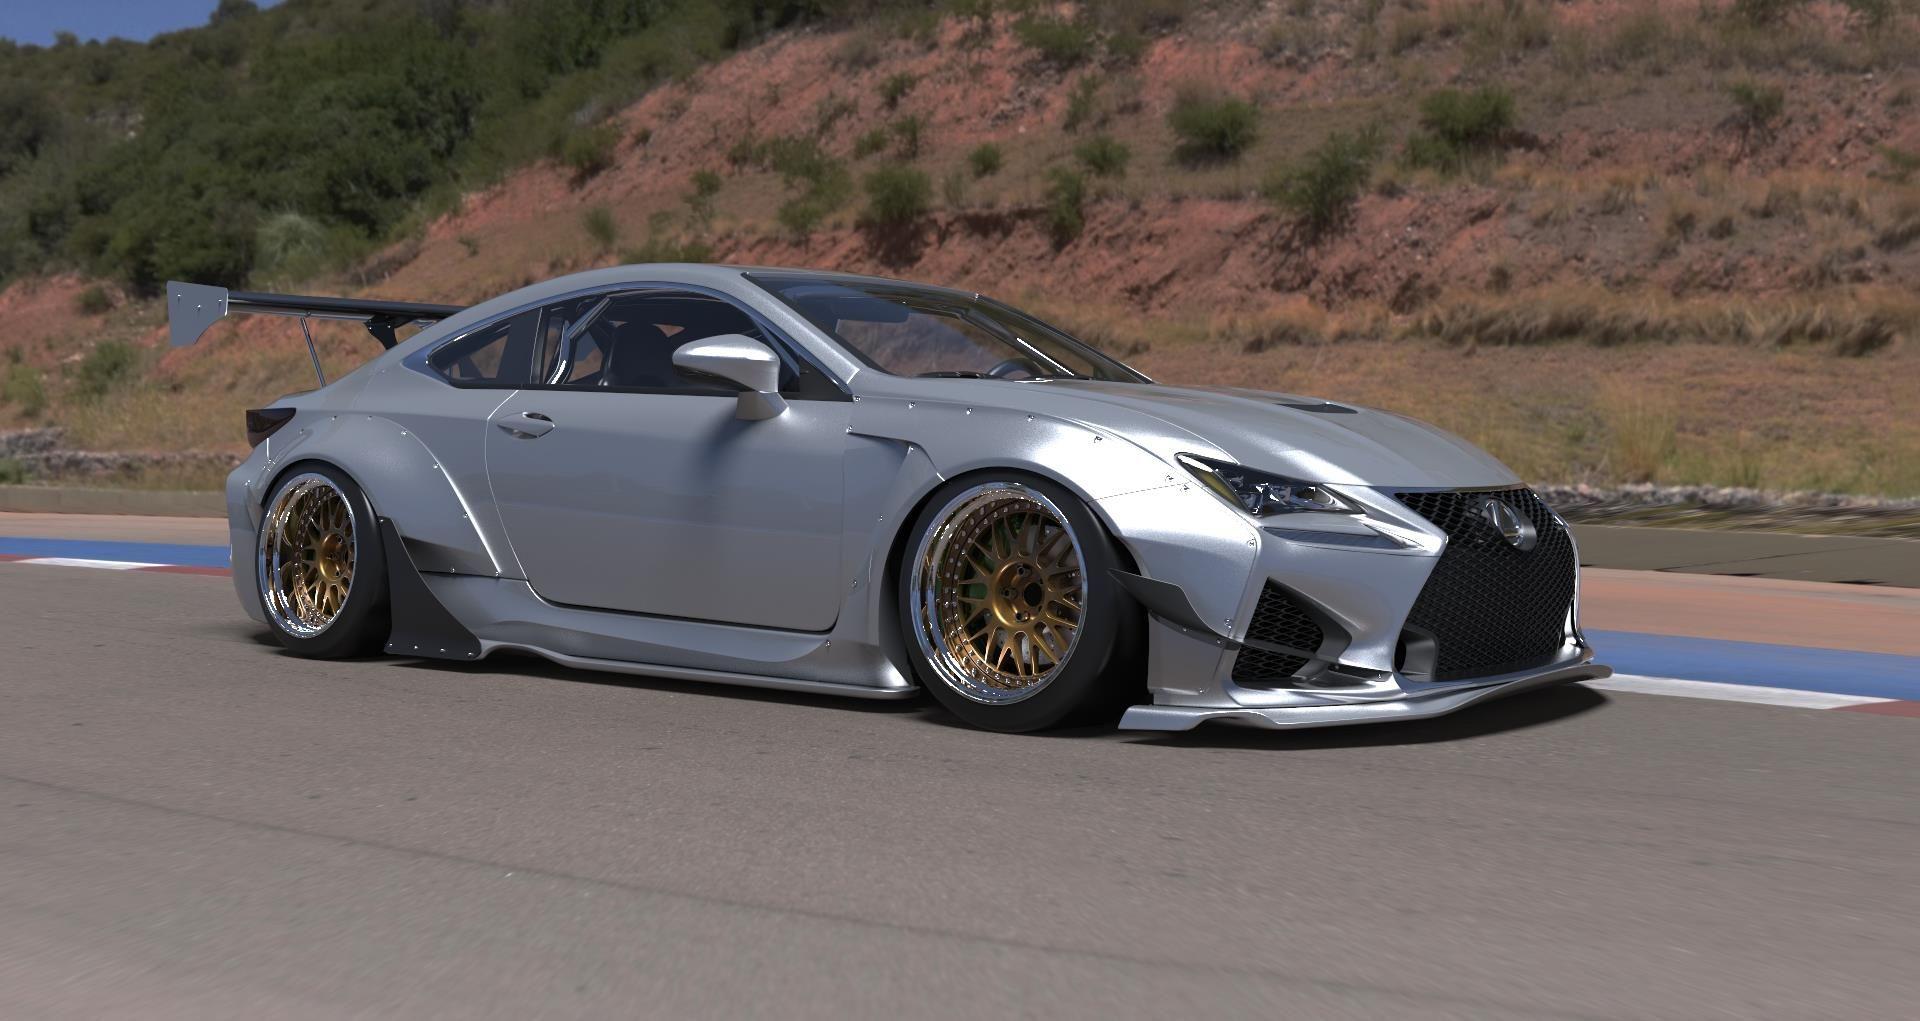 Quick Shots Rocket Bunny Lexus Rc Lexus Super Luxury Cars Lexus Cars